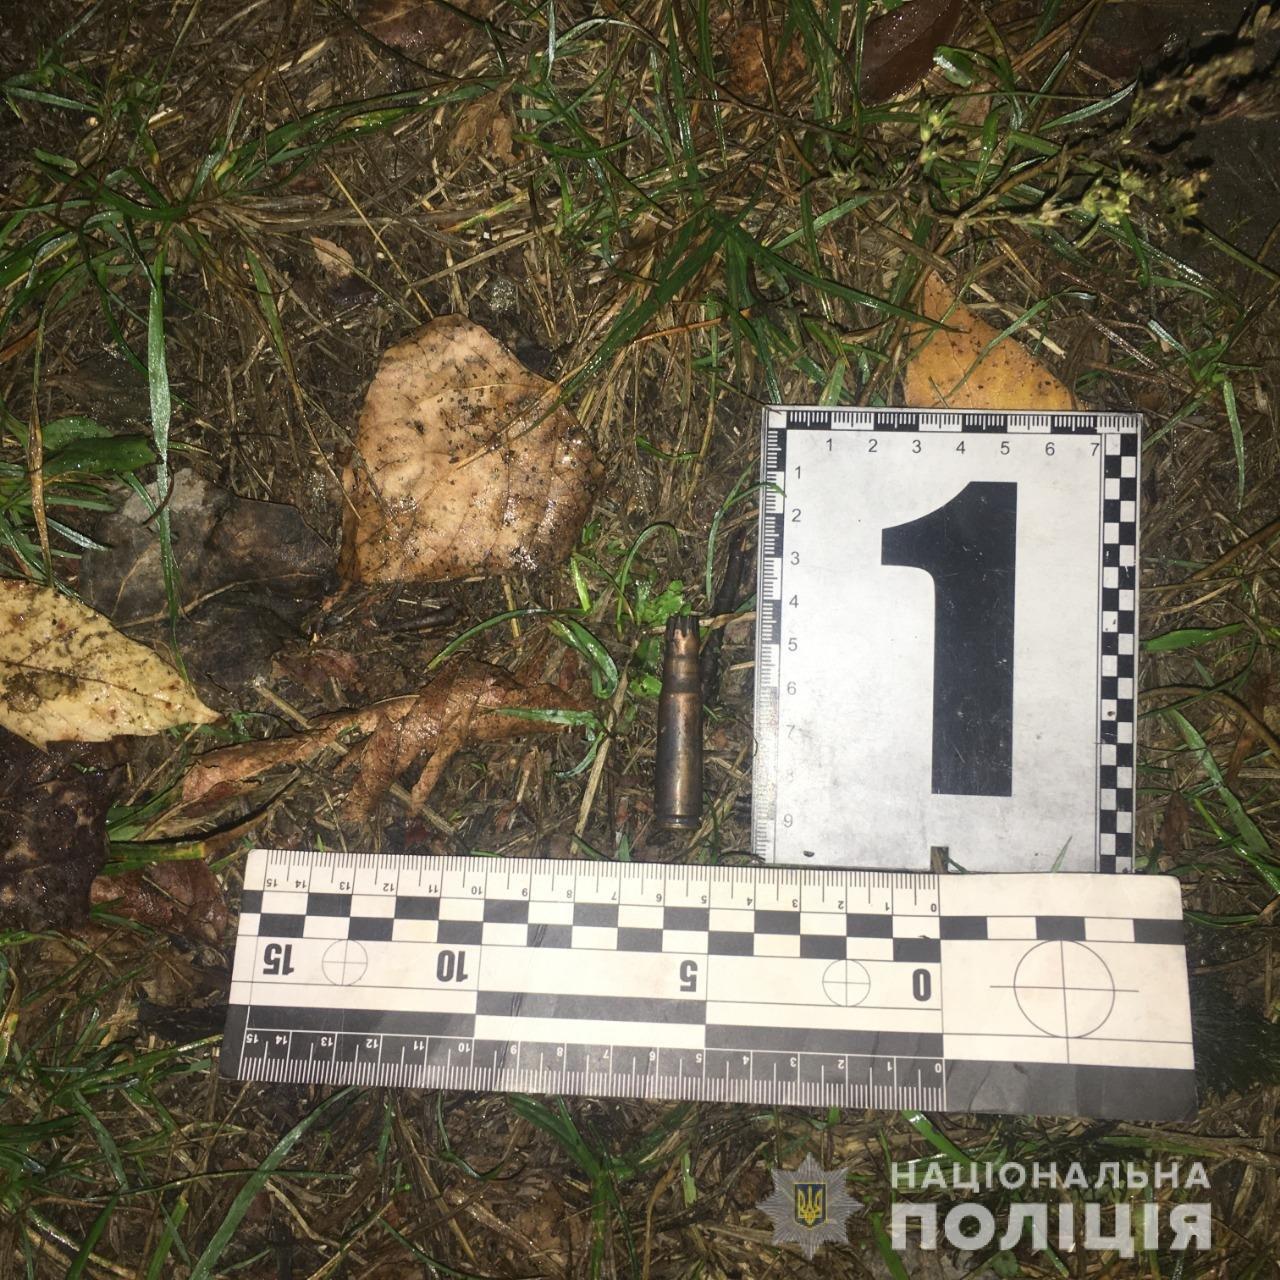 Напал и ограбил дайвера на Харьковщине: полиция задержала подозреваемого, - ФОТО, фото-1